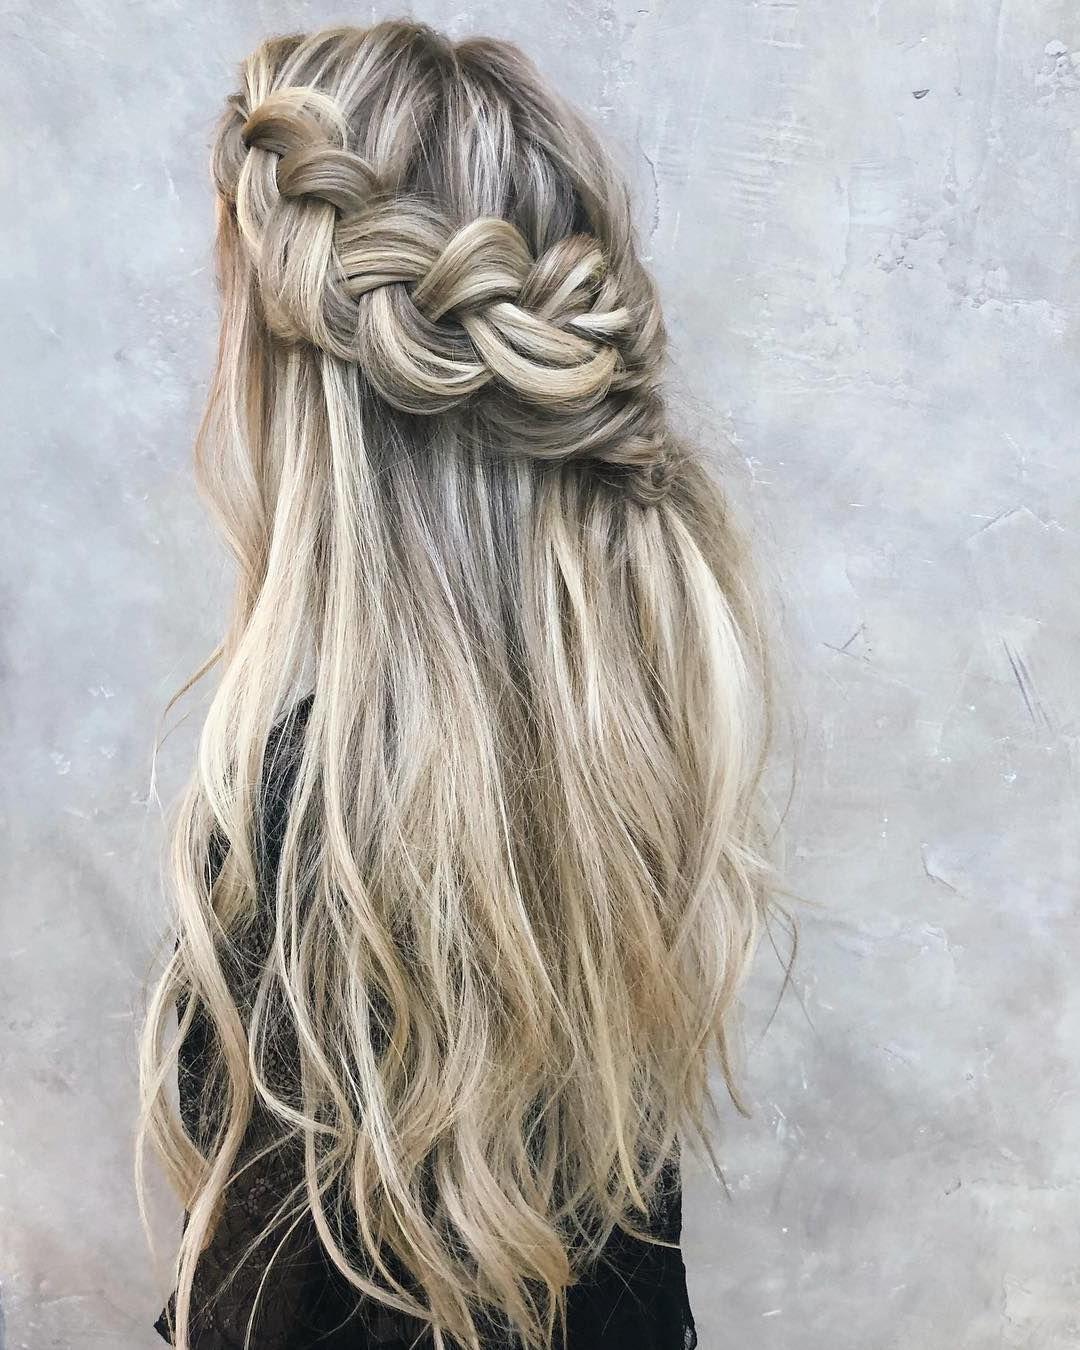 2019 Boho Half Braid Hairstyles With Regard To 49 Boho Braid Hairstyles To Try – Blonde Hair + Big Braid (View 17 of 20)